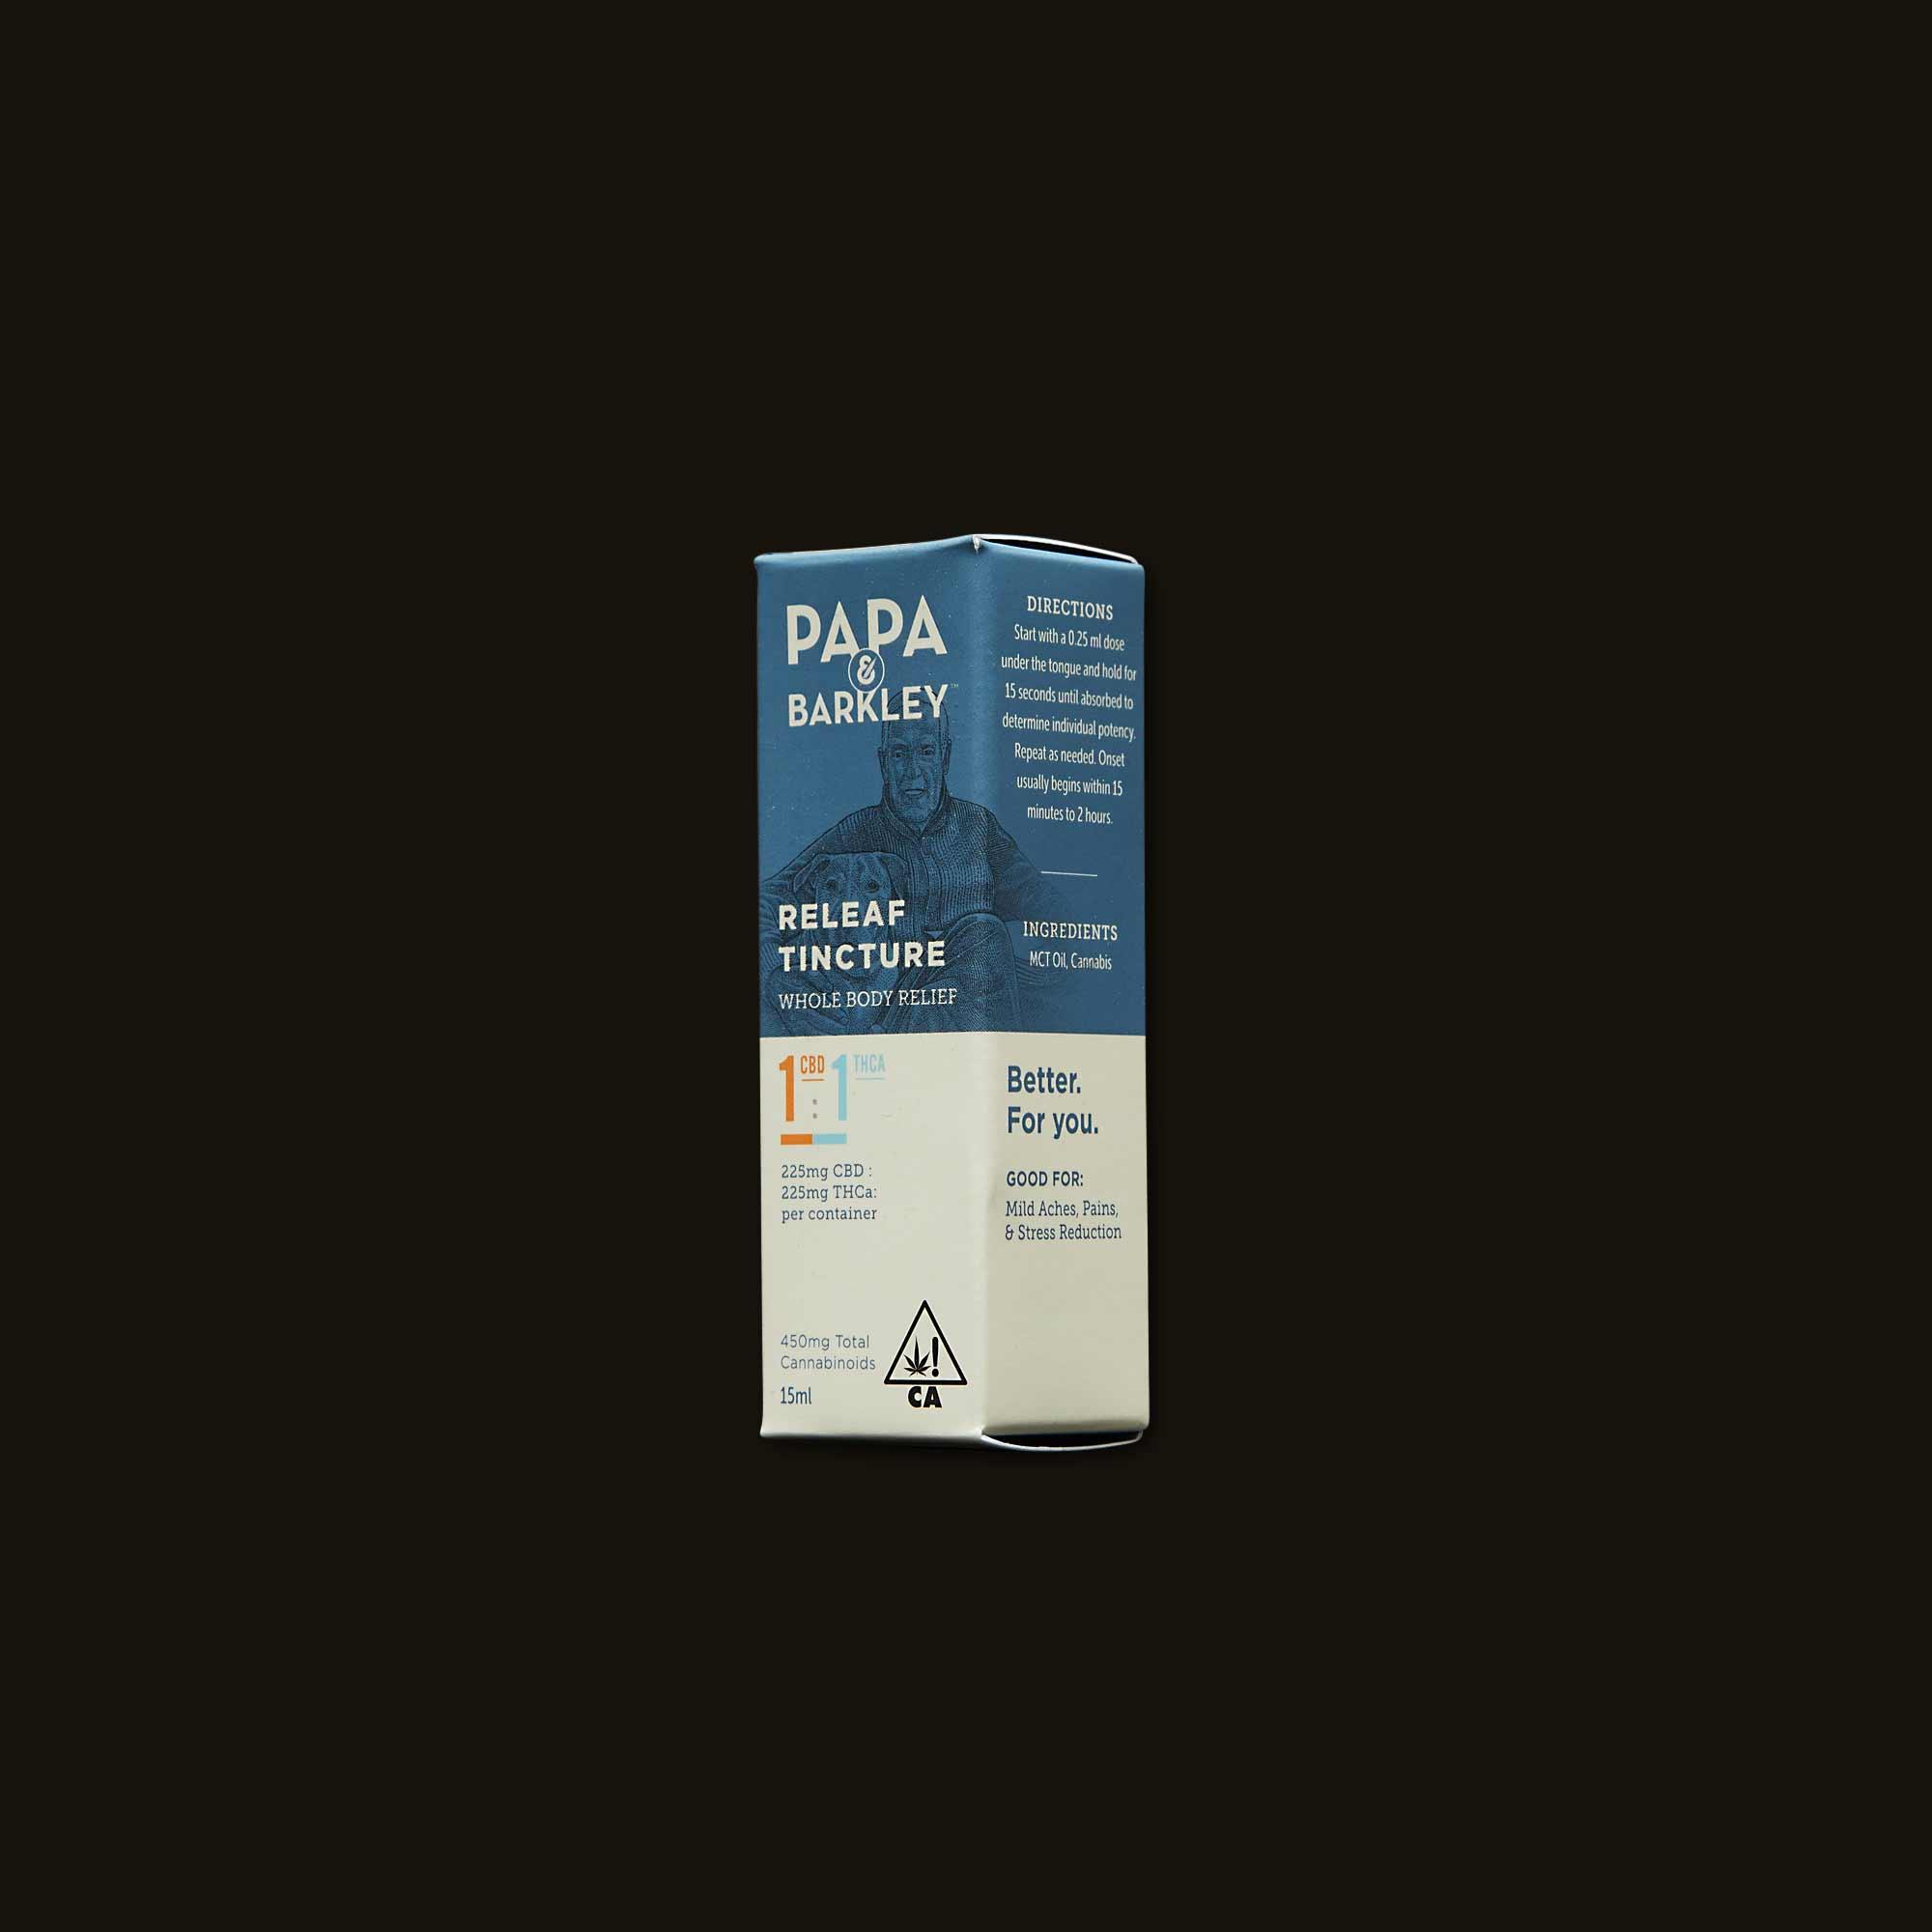 1:1 CBD:THCa Releaf Tincture - One 15ml bottle (225mg THCa, 225mg CBD)